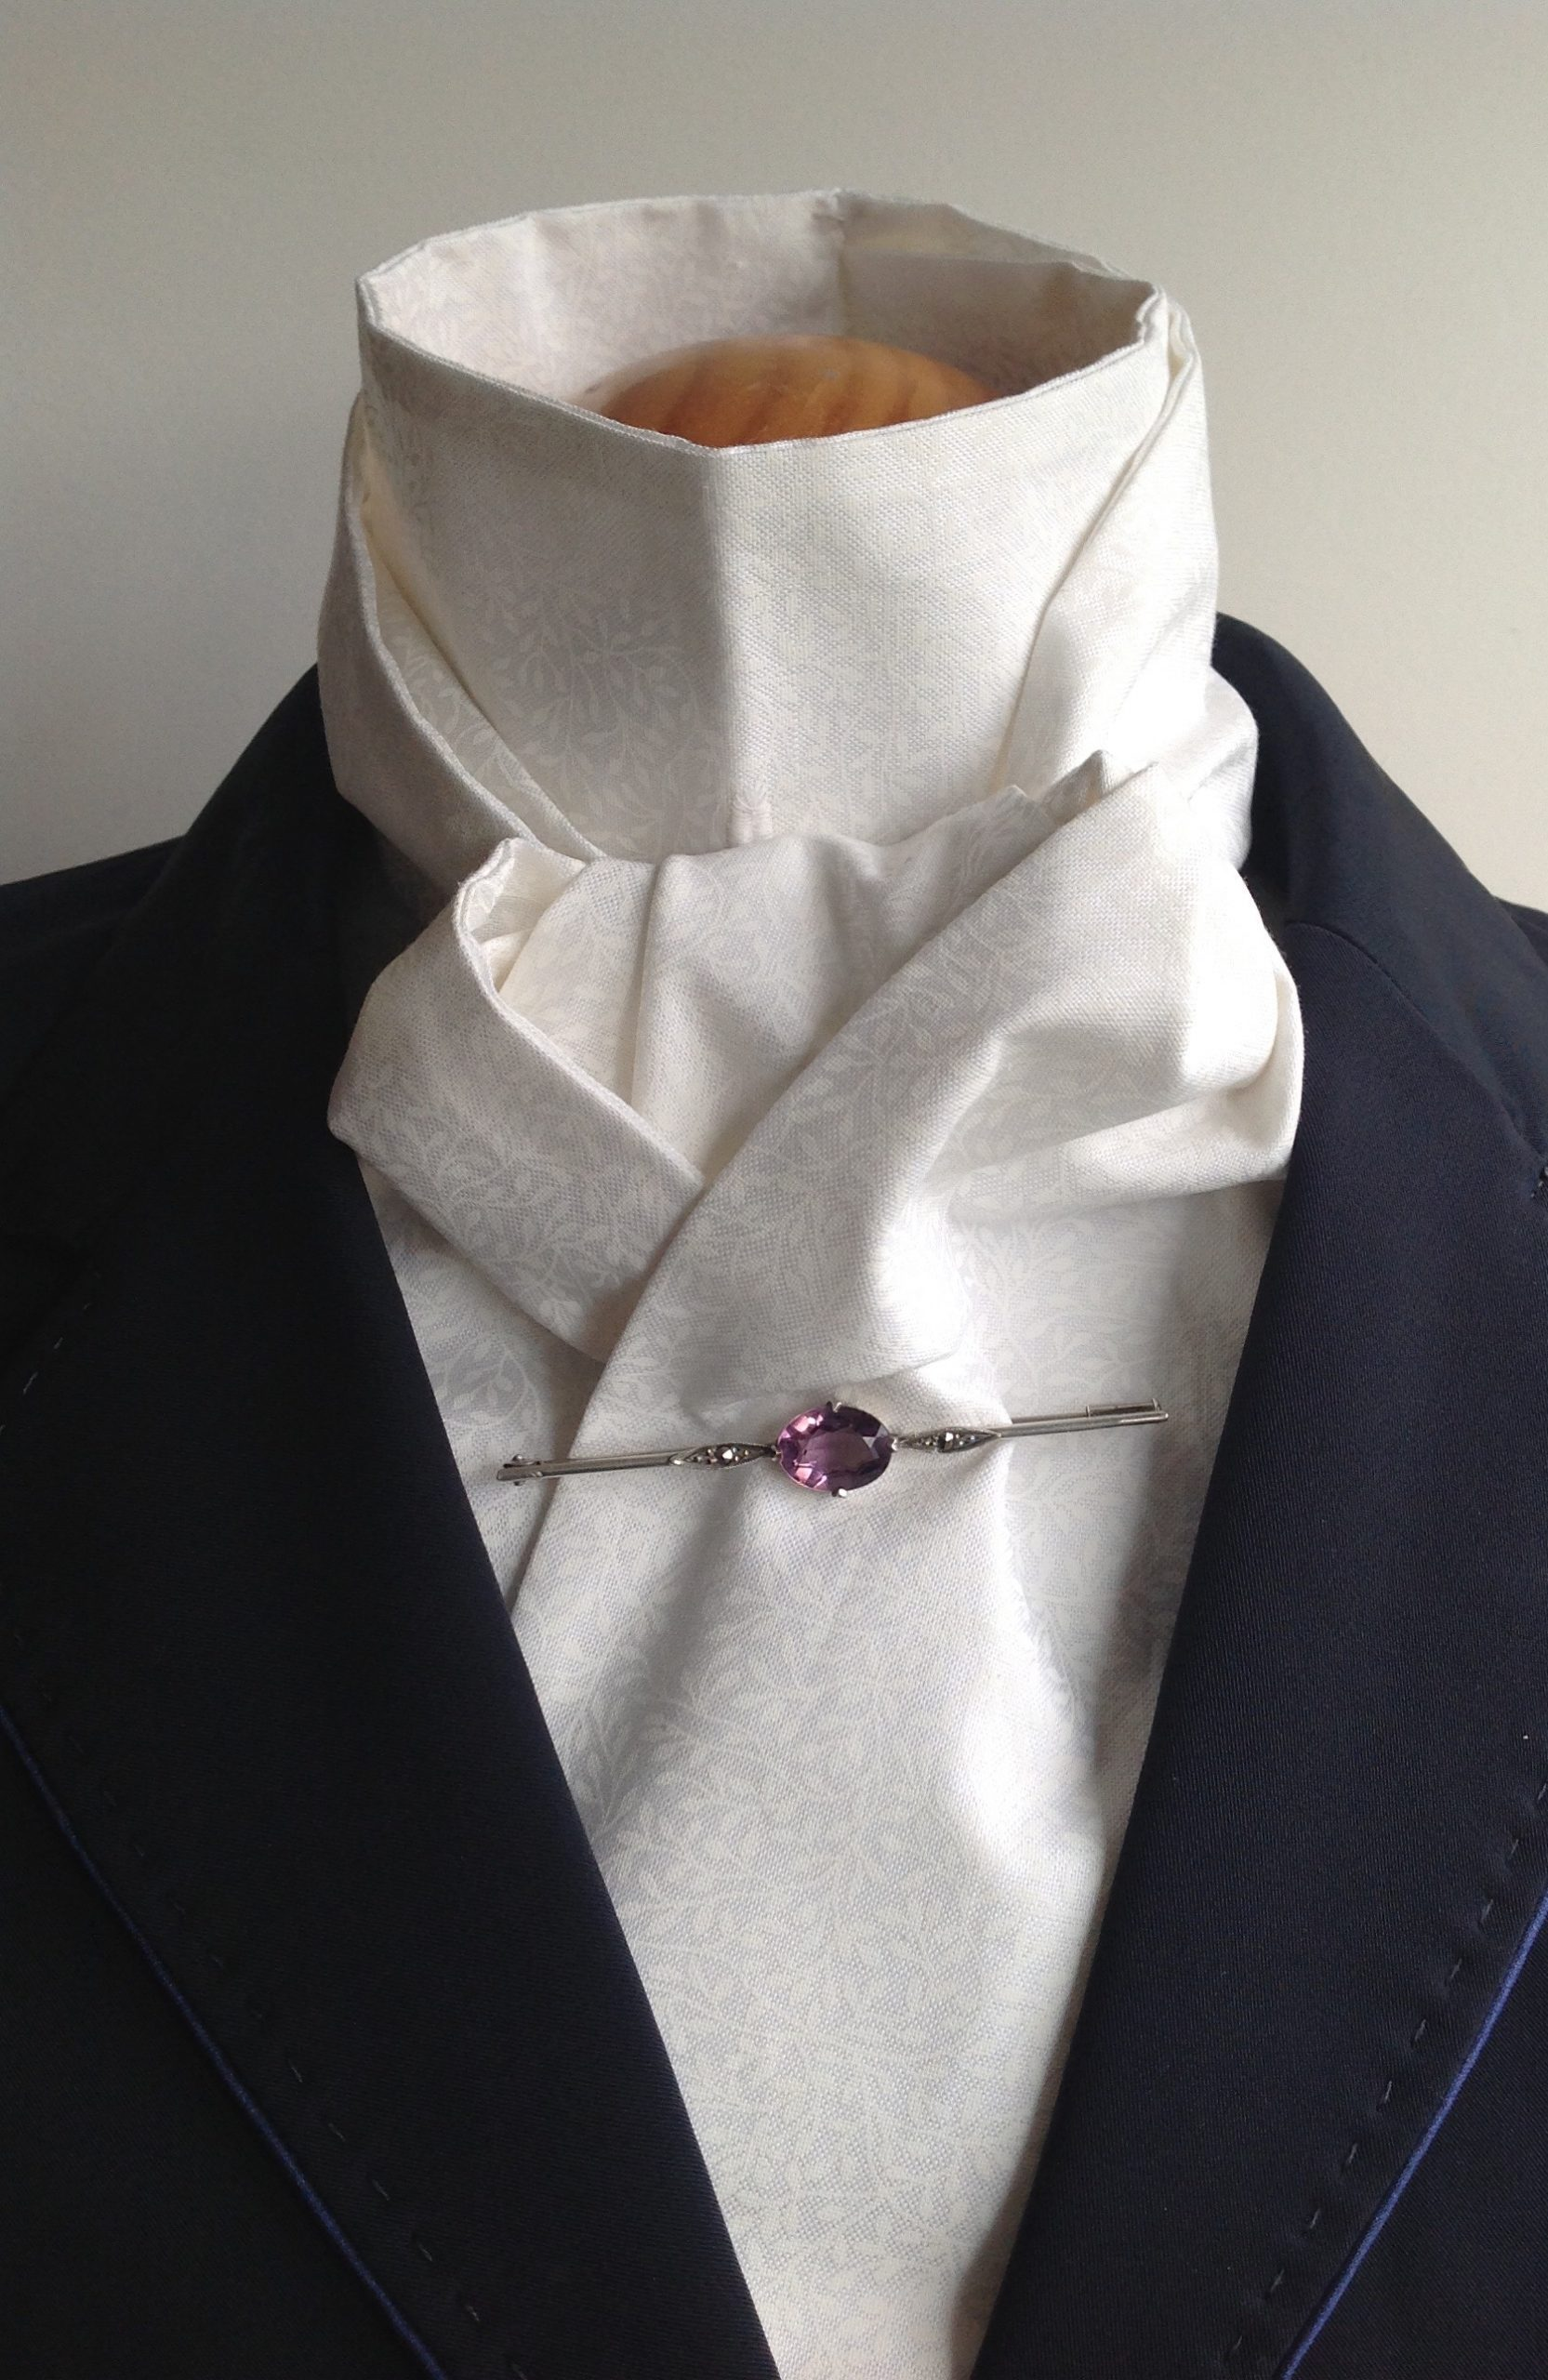 Shaped to tie 100% cotton stock - mini floral ecru/white